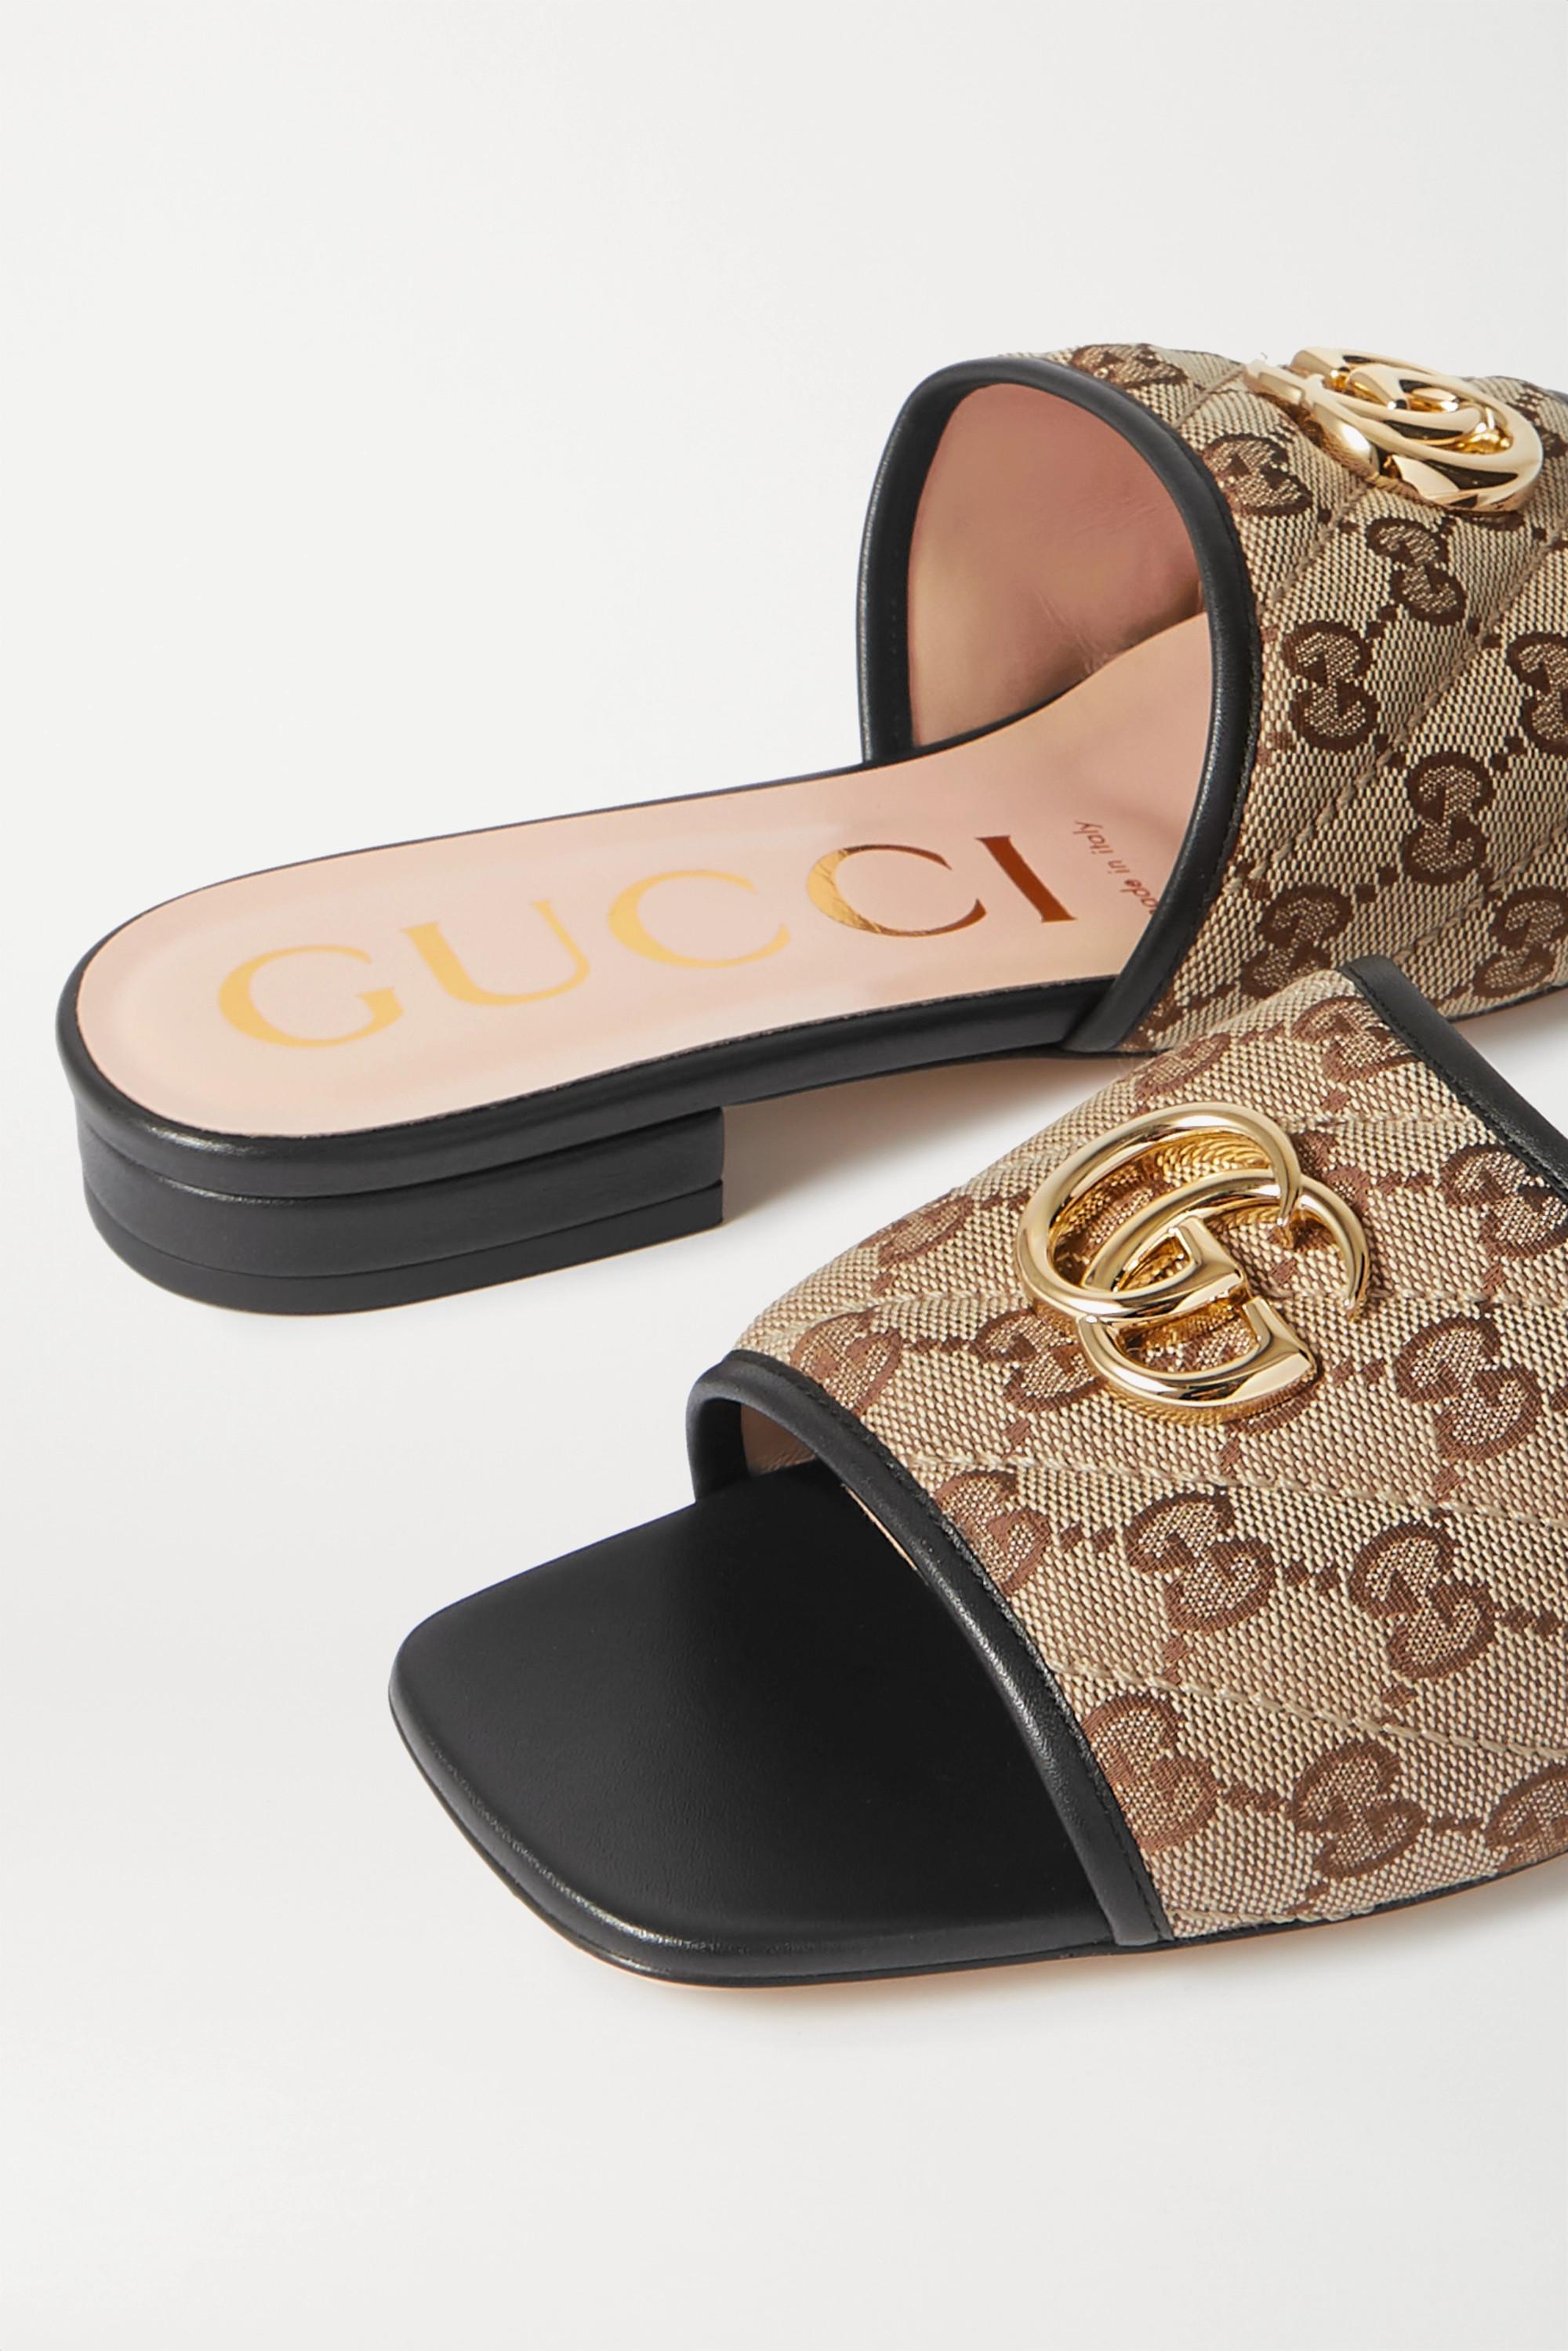 Gucci Jolie 皮革边饰带缀饰 Logo 细节帆布拖鞋